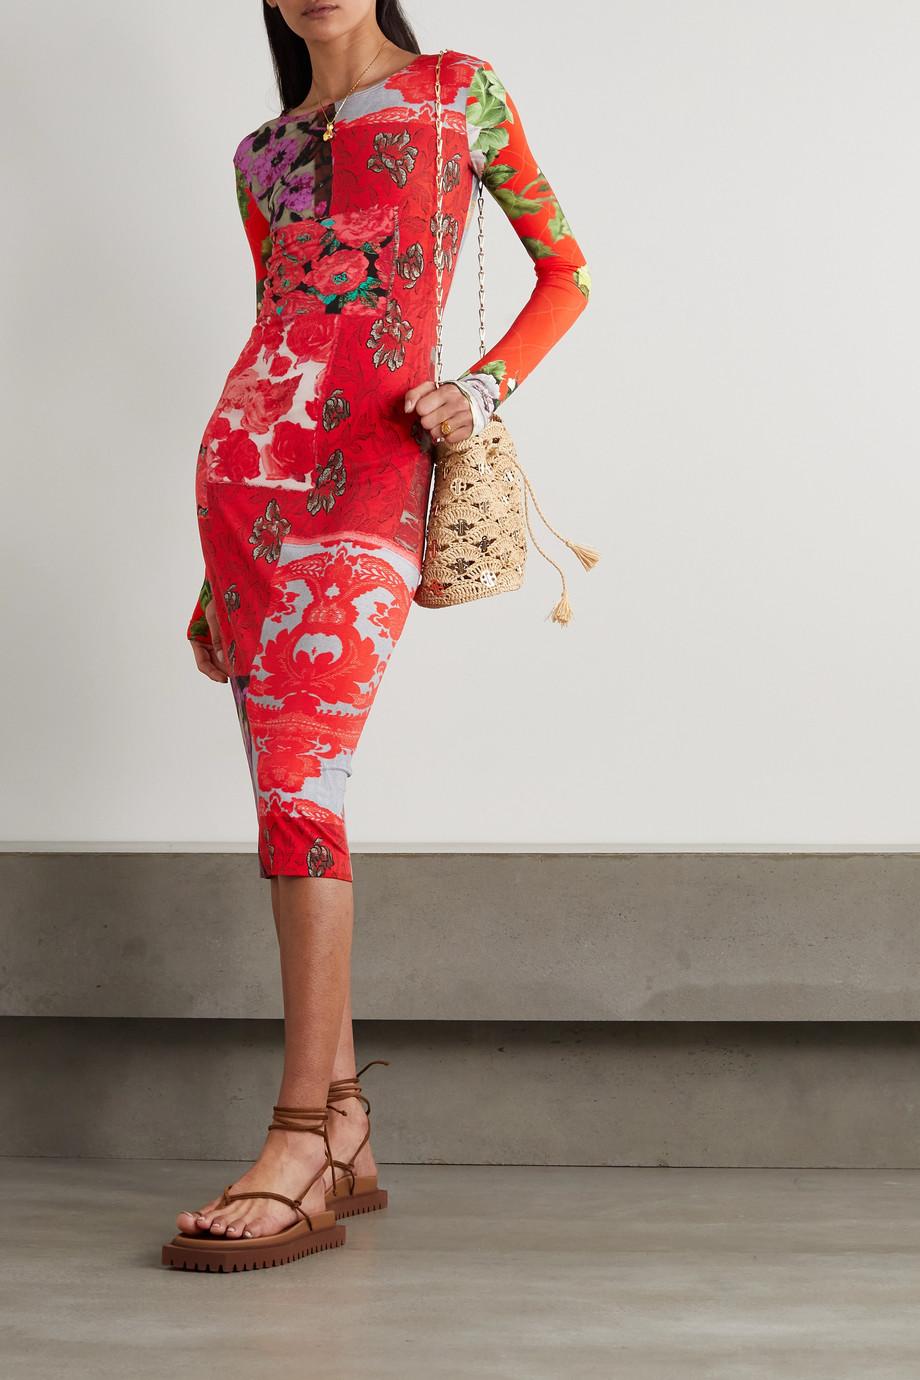 Preen by Thornton Bregazzi Gretal floral-print stretch-crepe dress